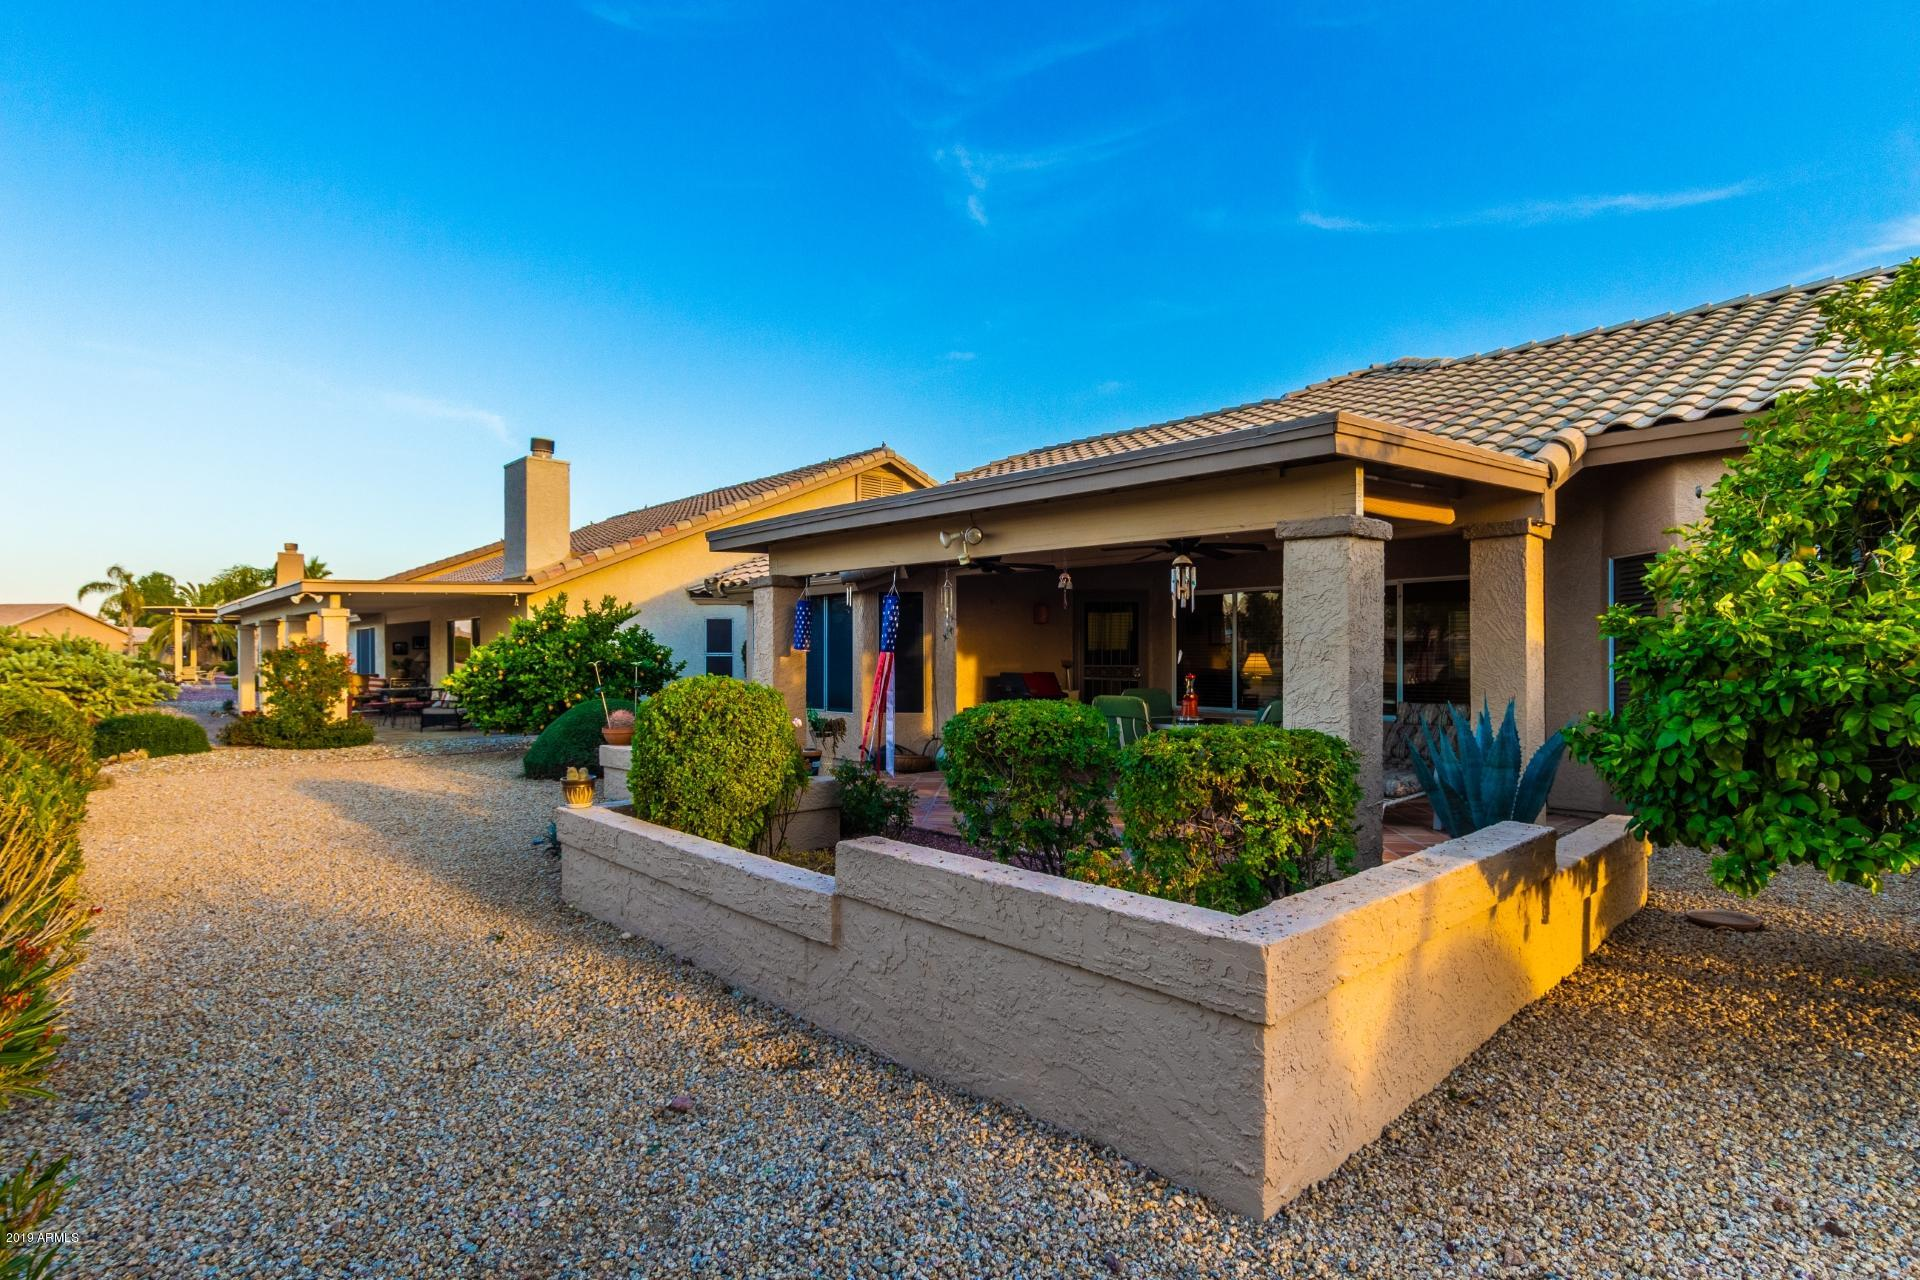 MLS 5867142 8738 W ROCKWOOD Drive, Peoria, AZ 85382 Peoria AZ Westbrook Village